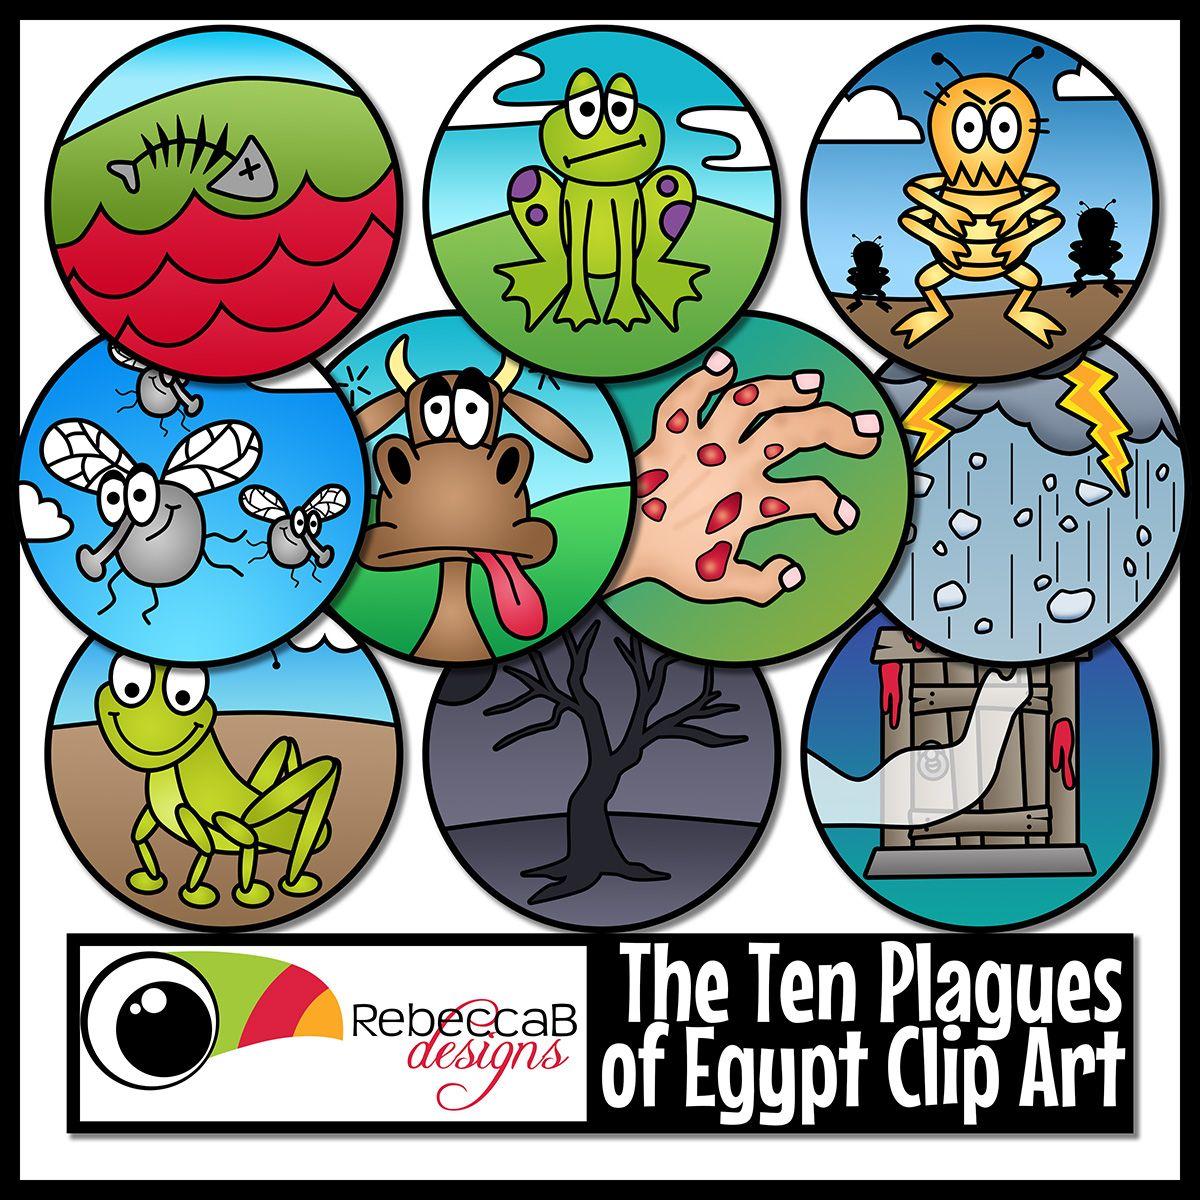 Ten Plagues of Egypt Clip Art (Moses) | Clip art, Sunday school and ...